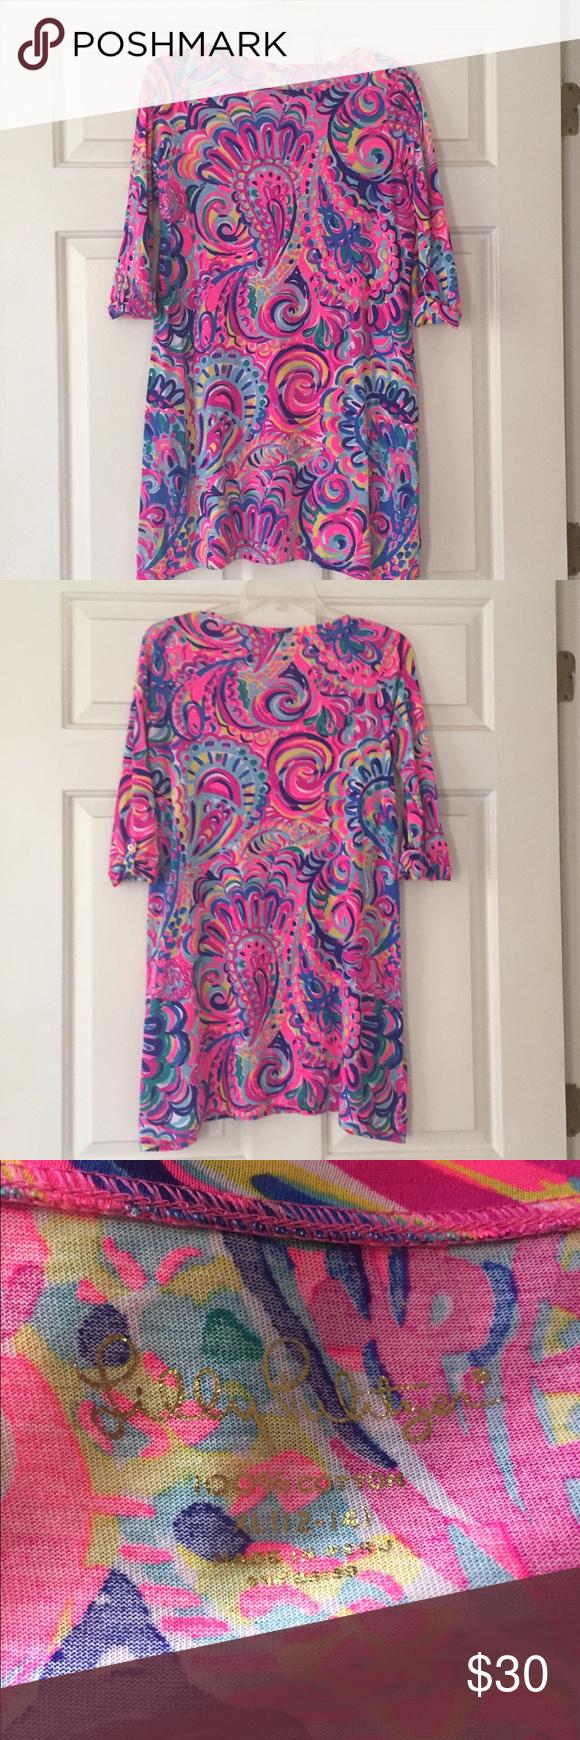 edb37259ac9e51 Lilly Pulitzer Edna Dress - Psychedelic Sunshine EUC Lilly Pulitzer Mini  Edna dress in girls XL